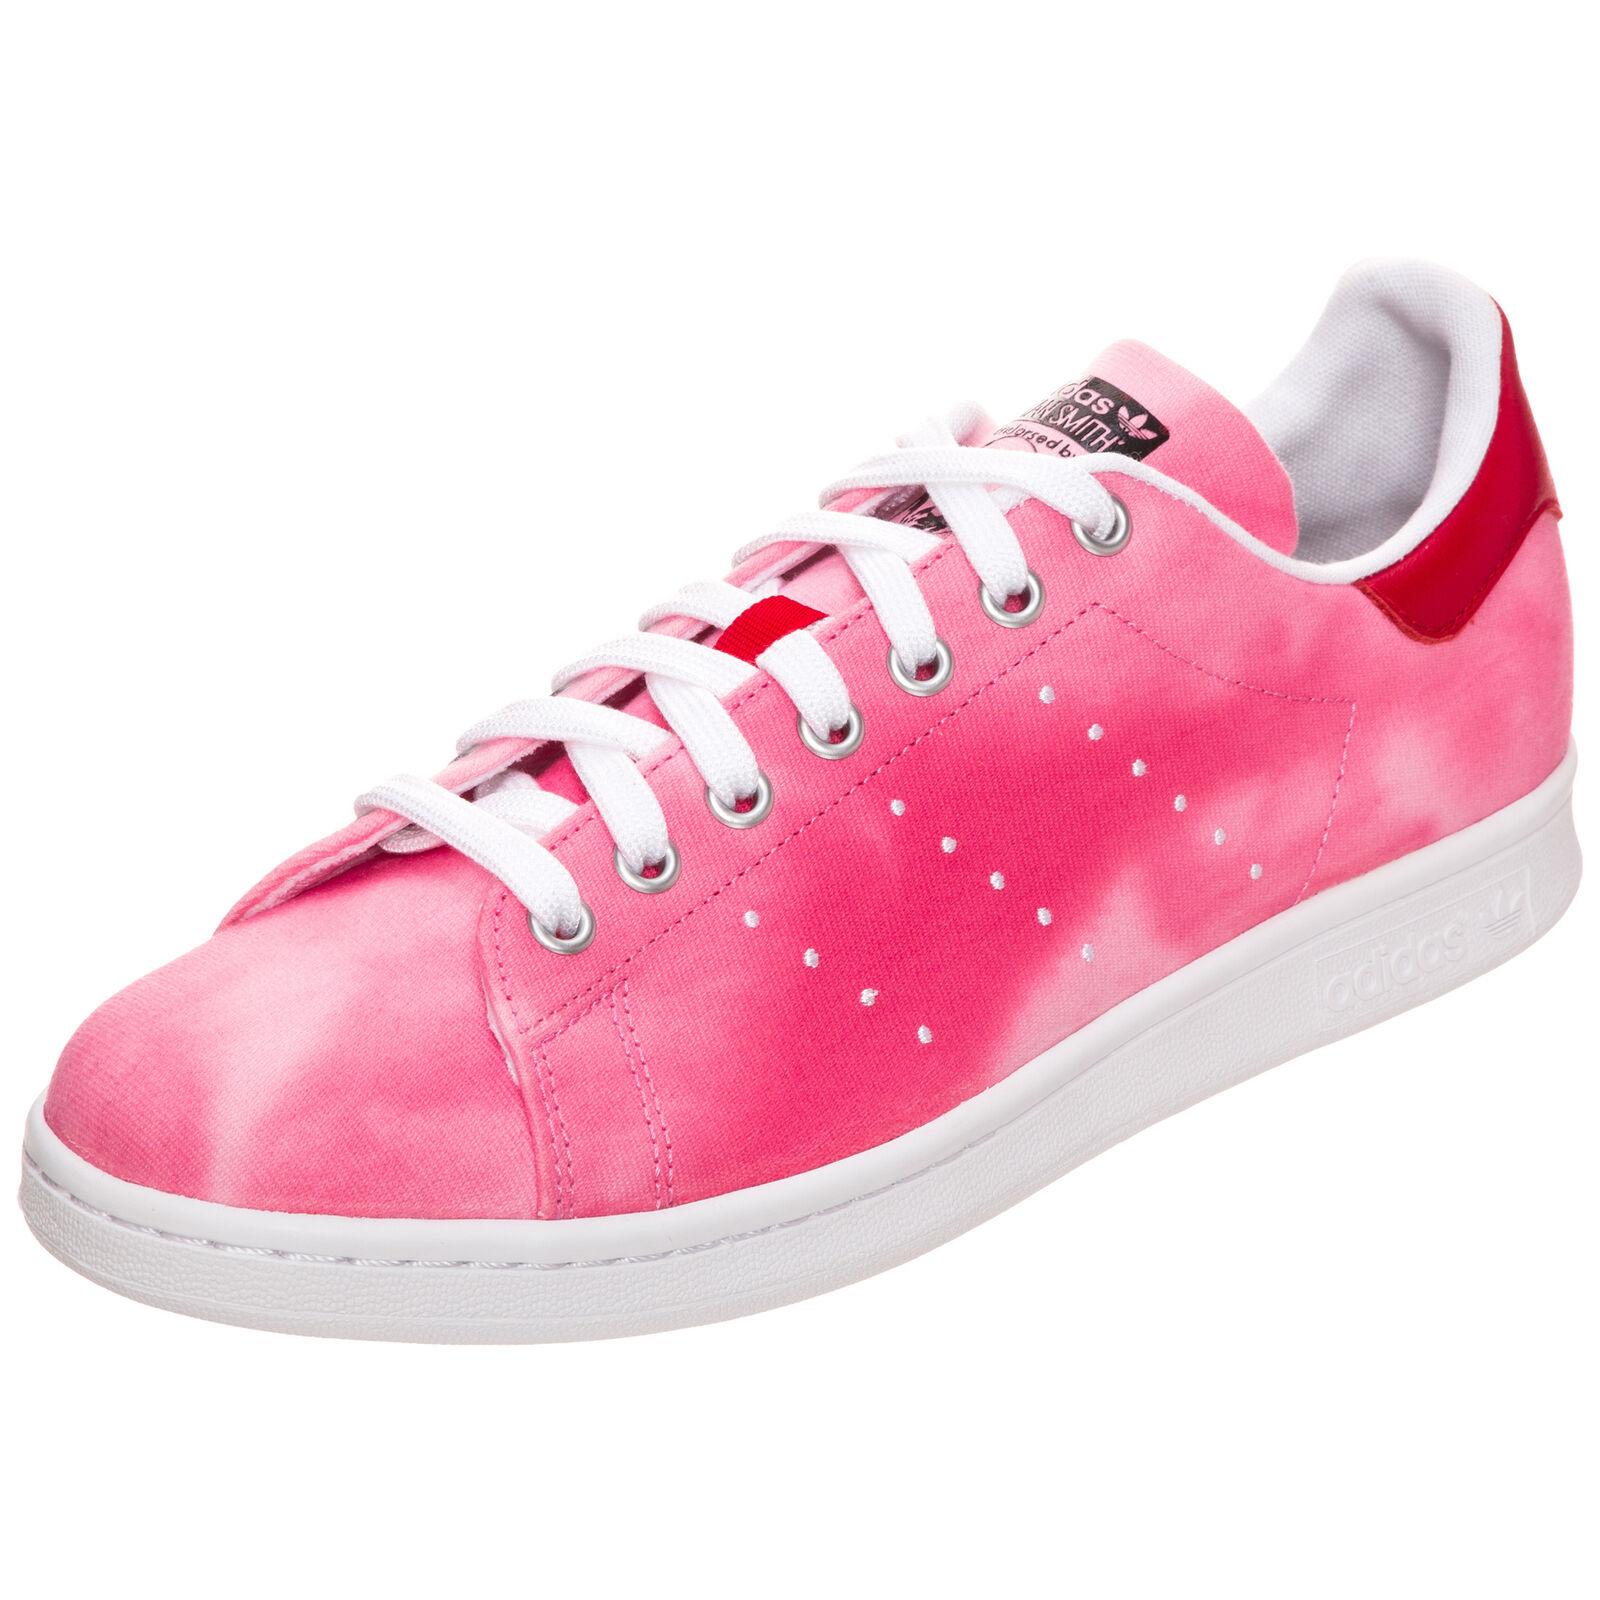 adidas Originals Stan Smith Pharrell Williams Holi Pack Sneaker Rosatöne NEU